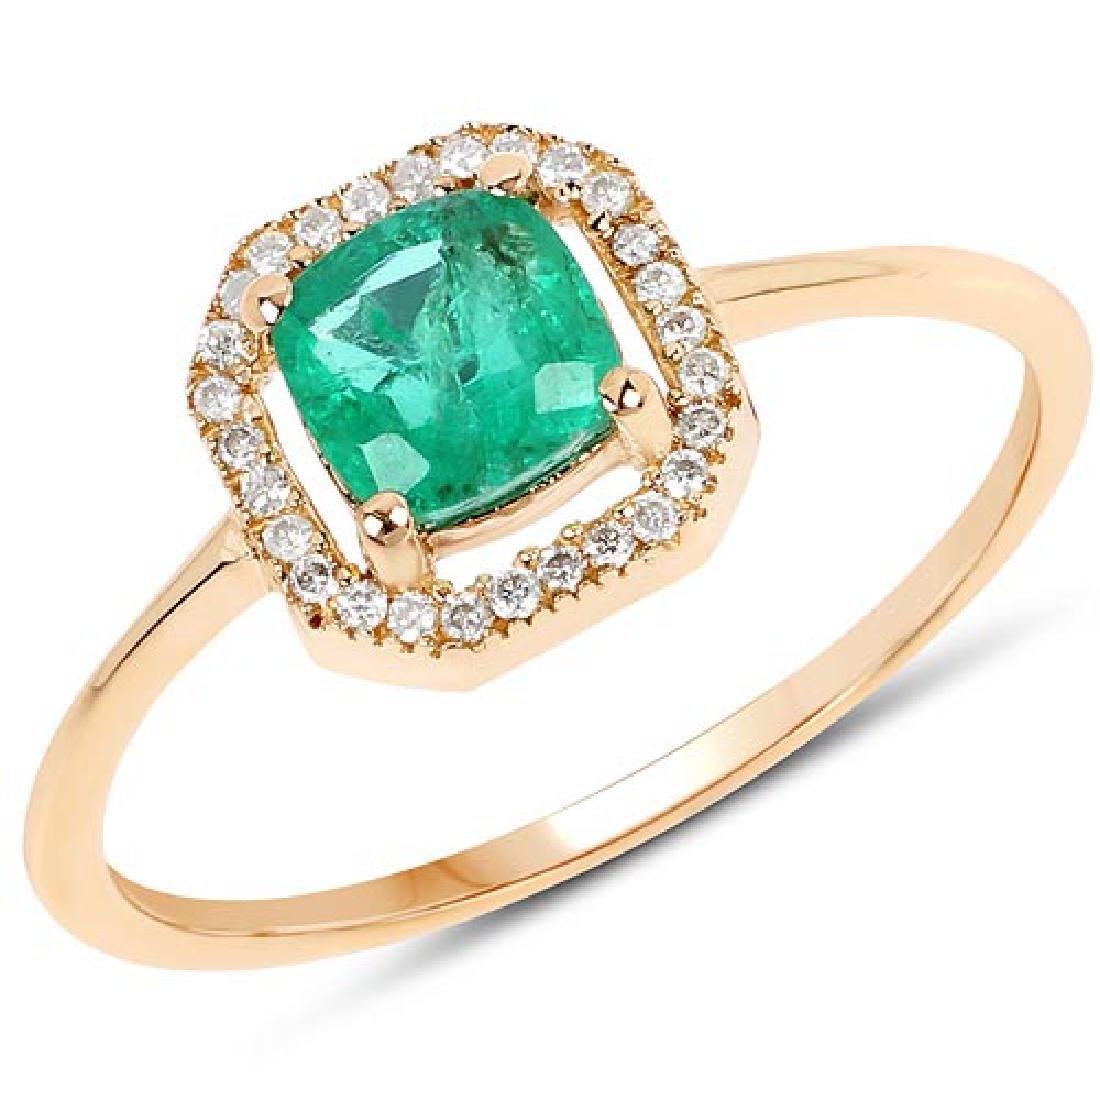 0.63 CTW Genuine Zambian Emerald and White Diamond 14K